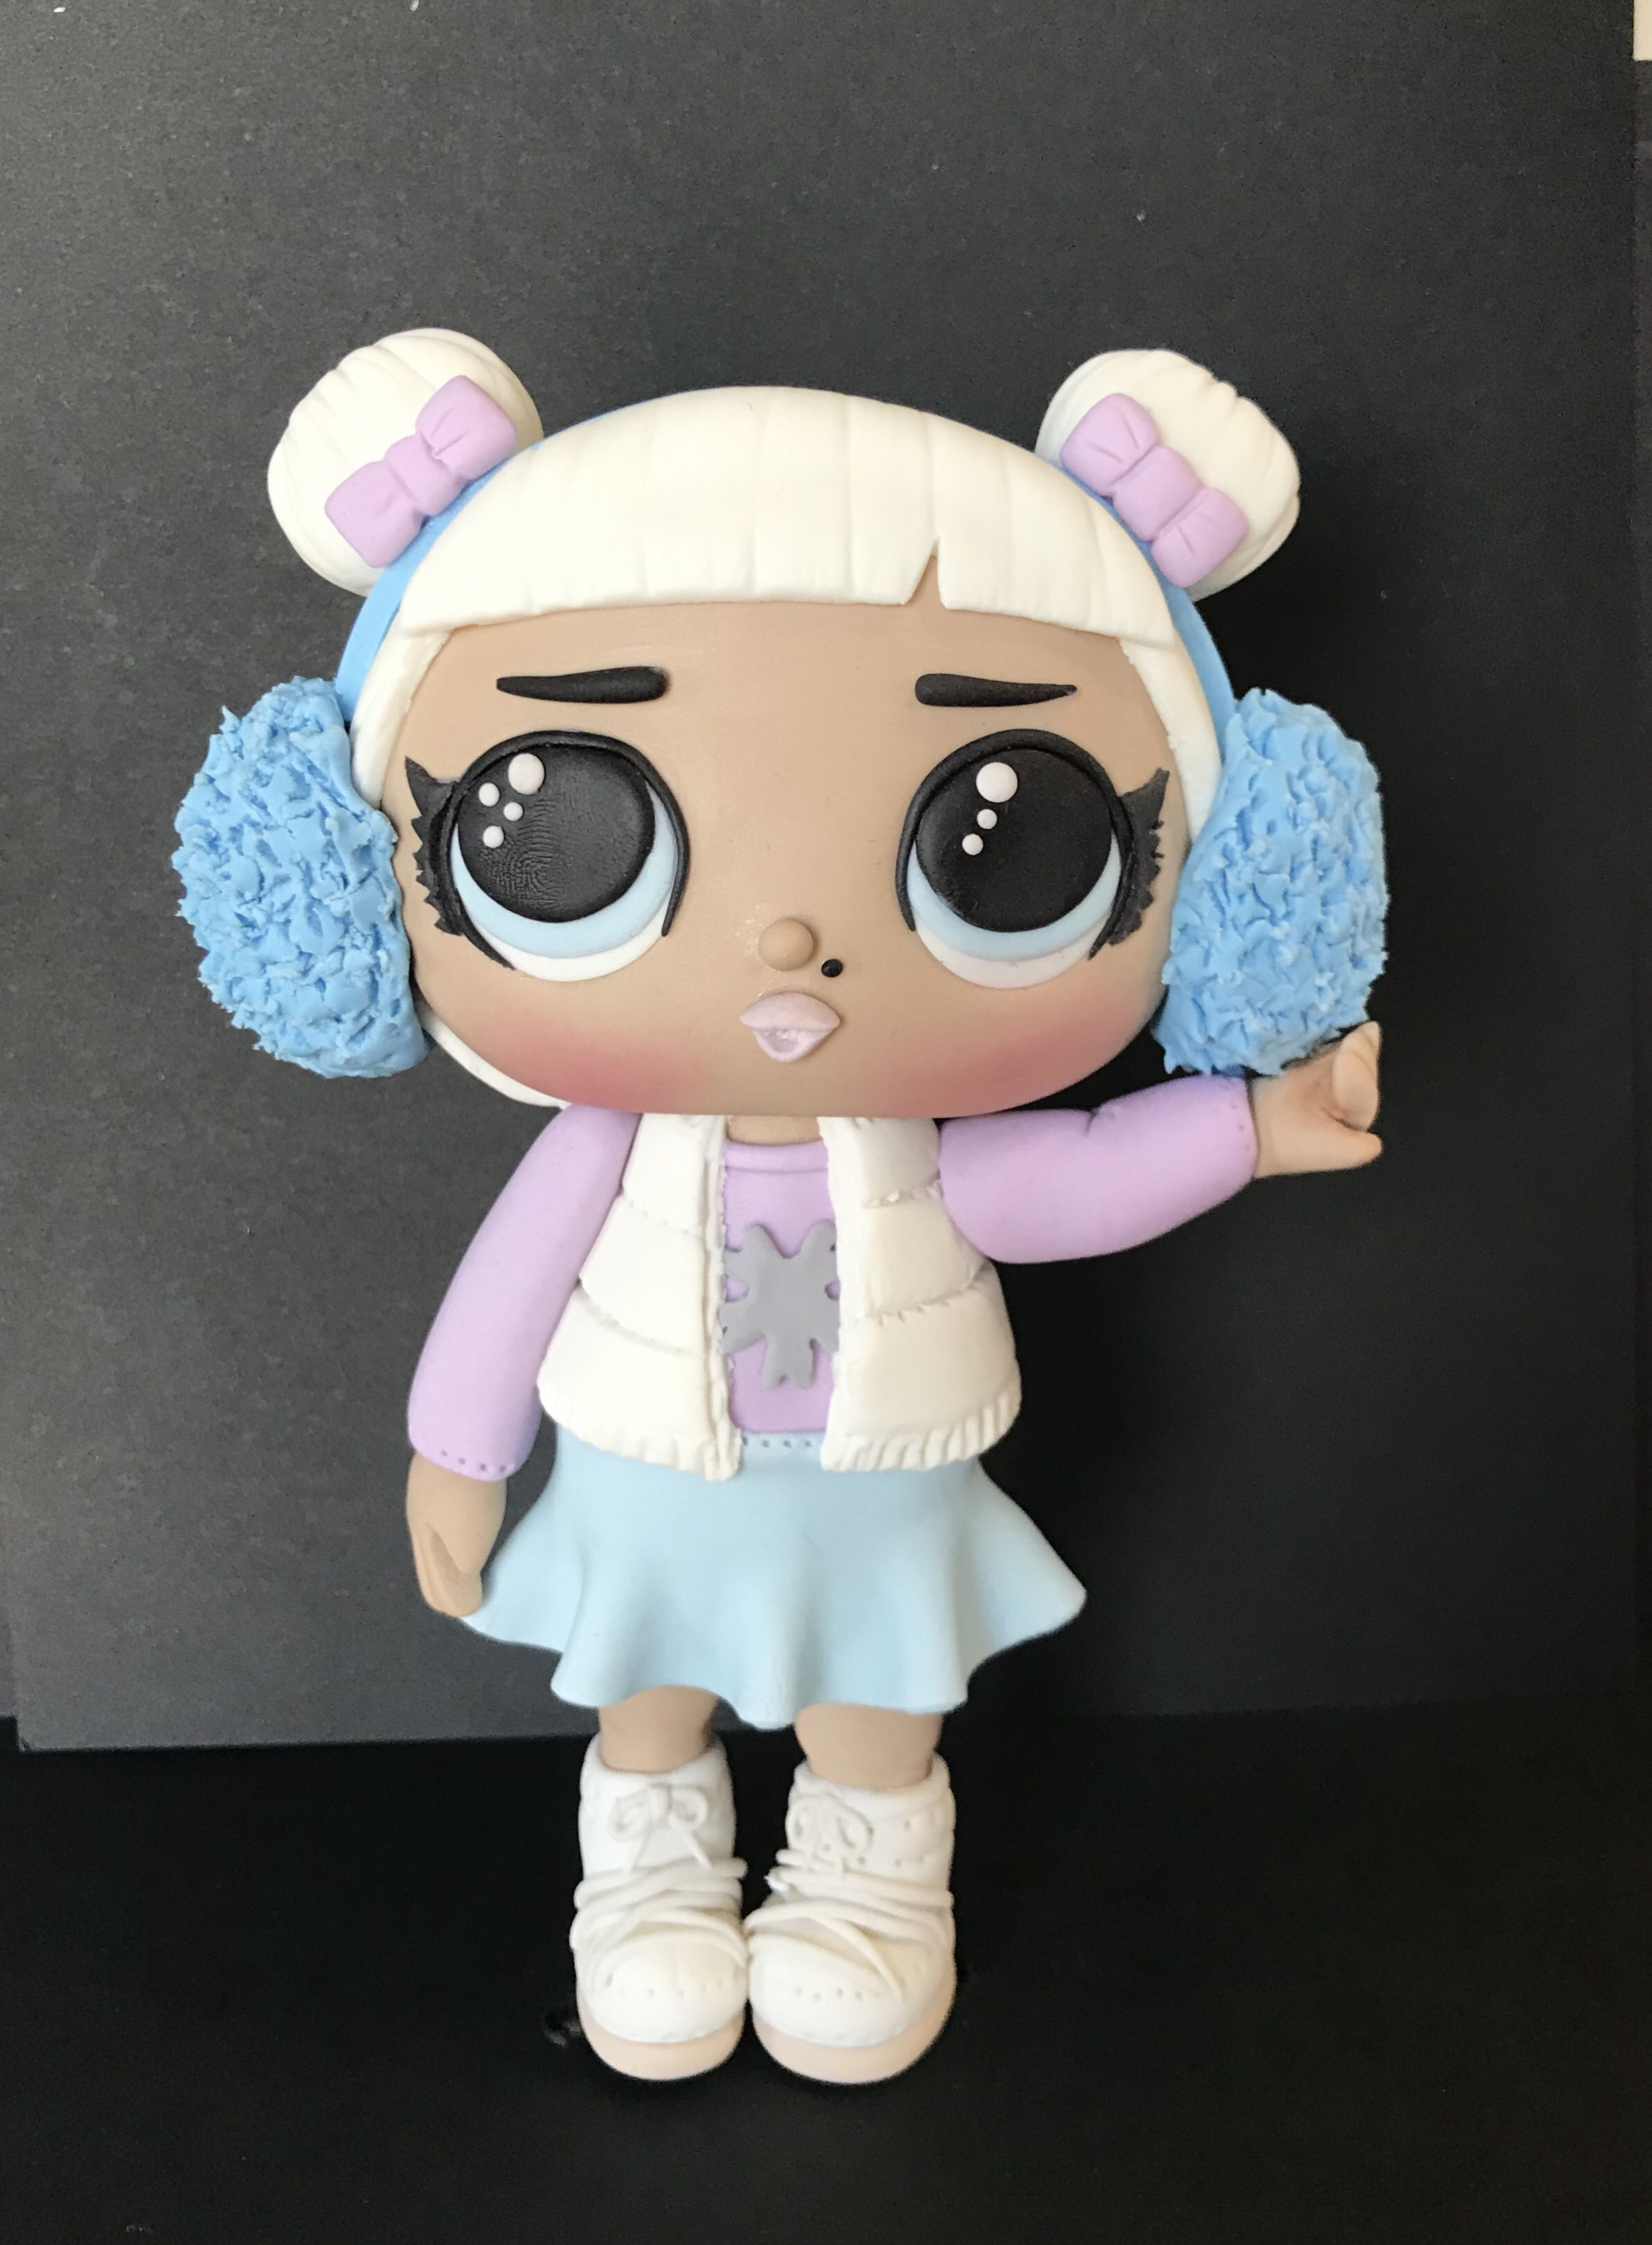 Lol Surprise Snow Angel Doll Fondant Figurine Doll Snow Angels Fondant Cake Toppers Cake Toppers